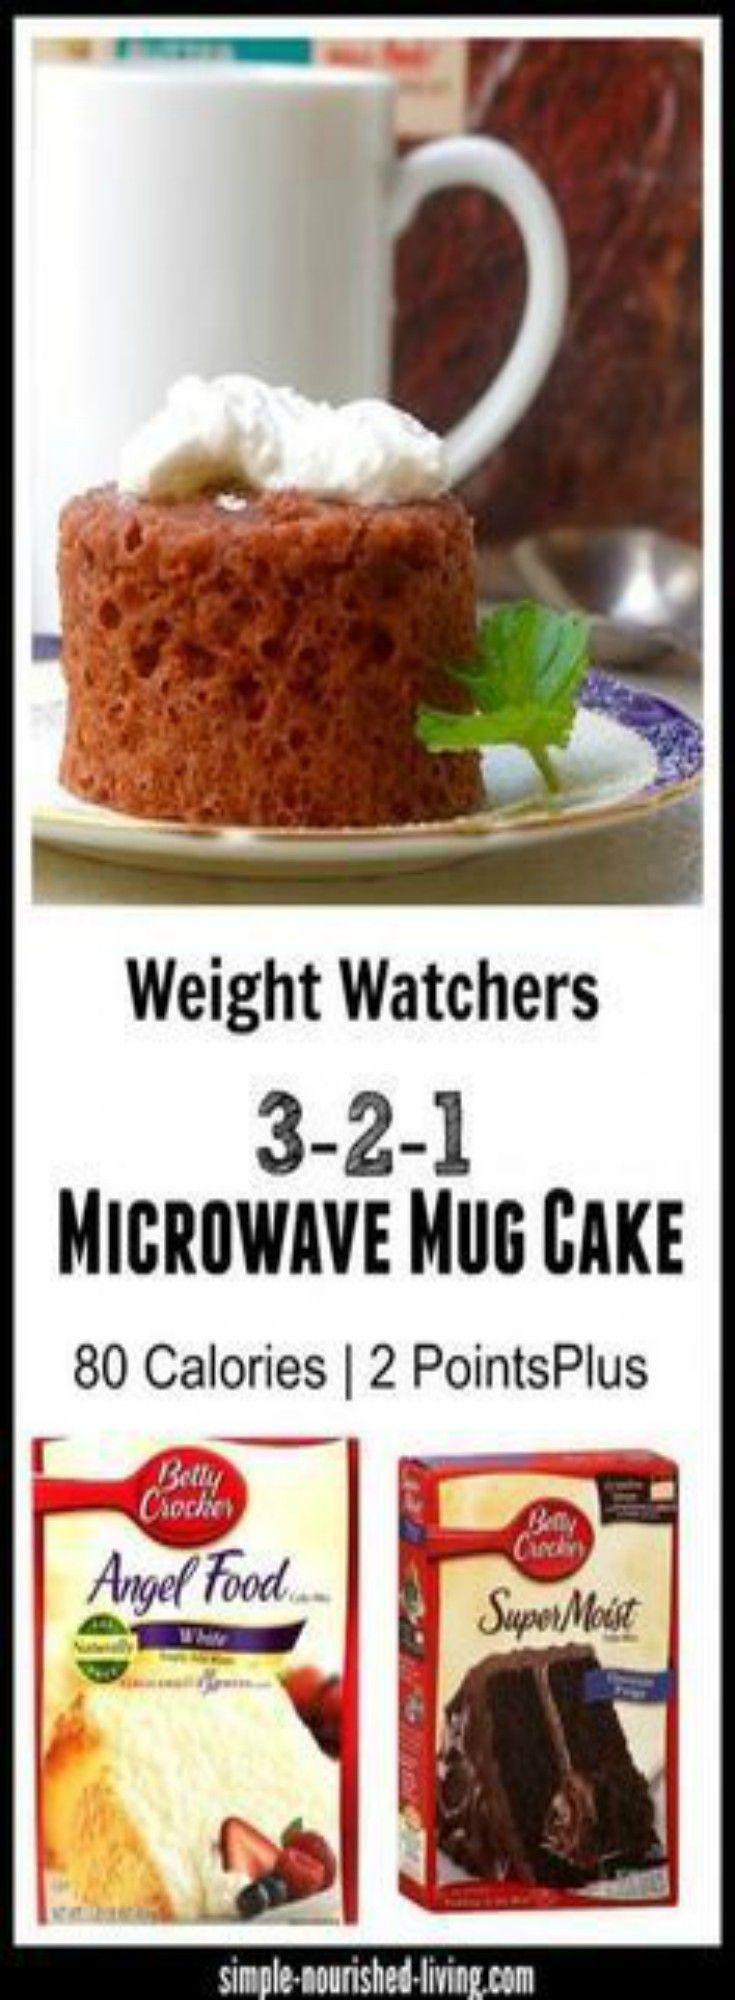 WEIGHT WATCHERS 3 2 1 MICROWAVE MUG CAKE 3 SmartPoints